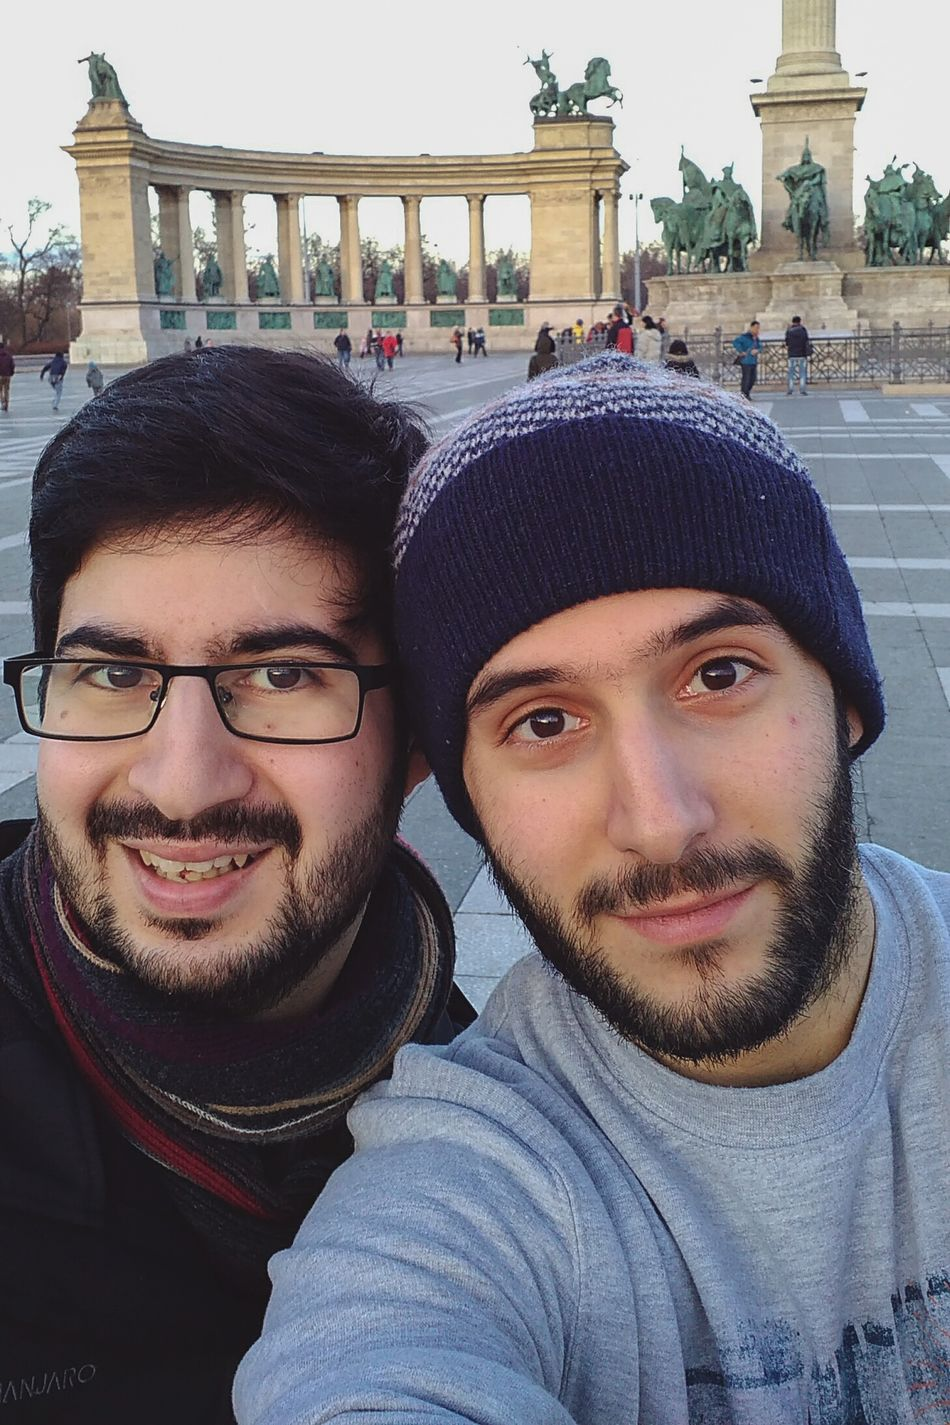 Bromance Brothers Selfie ✌ Travel City Budapest, Hungary Budapest Hungary Travel Destinations Me Beard